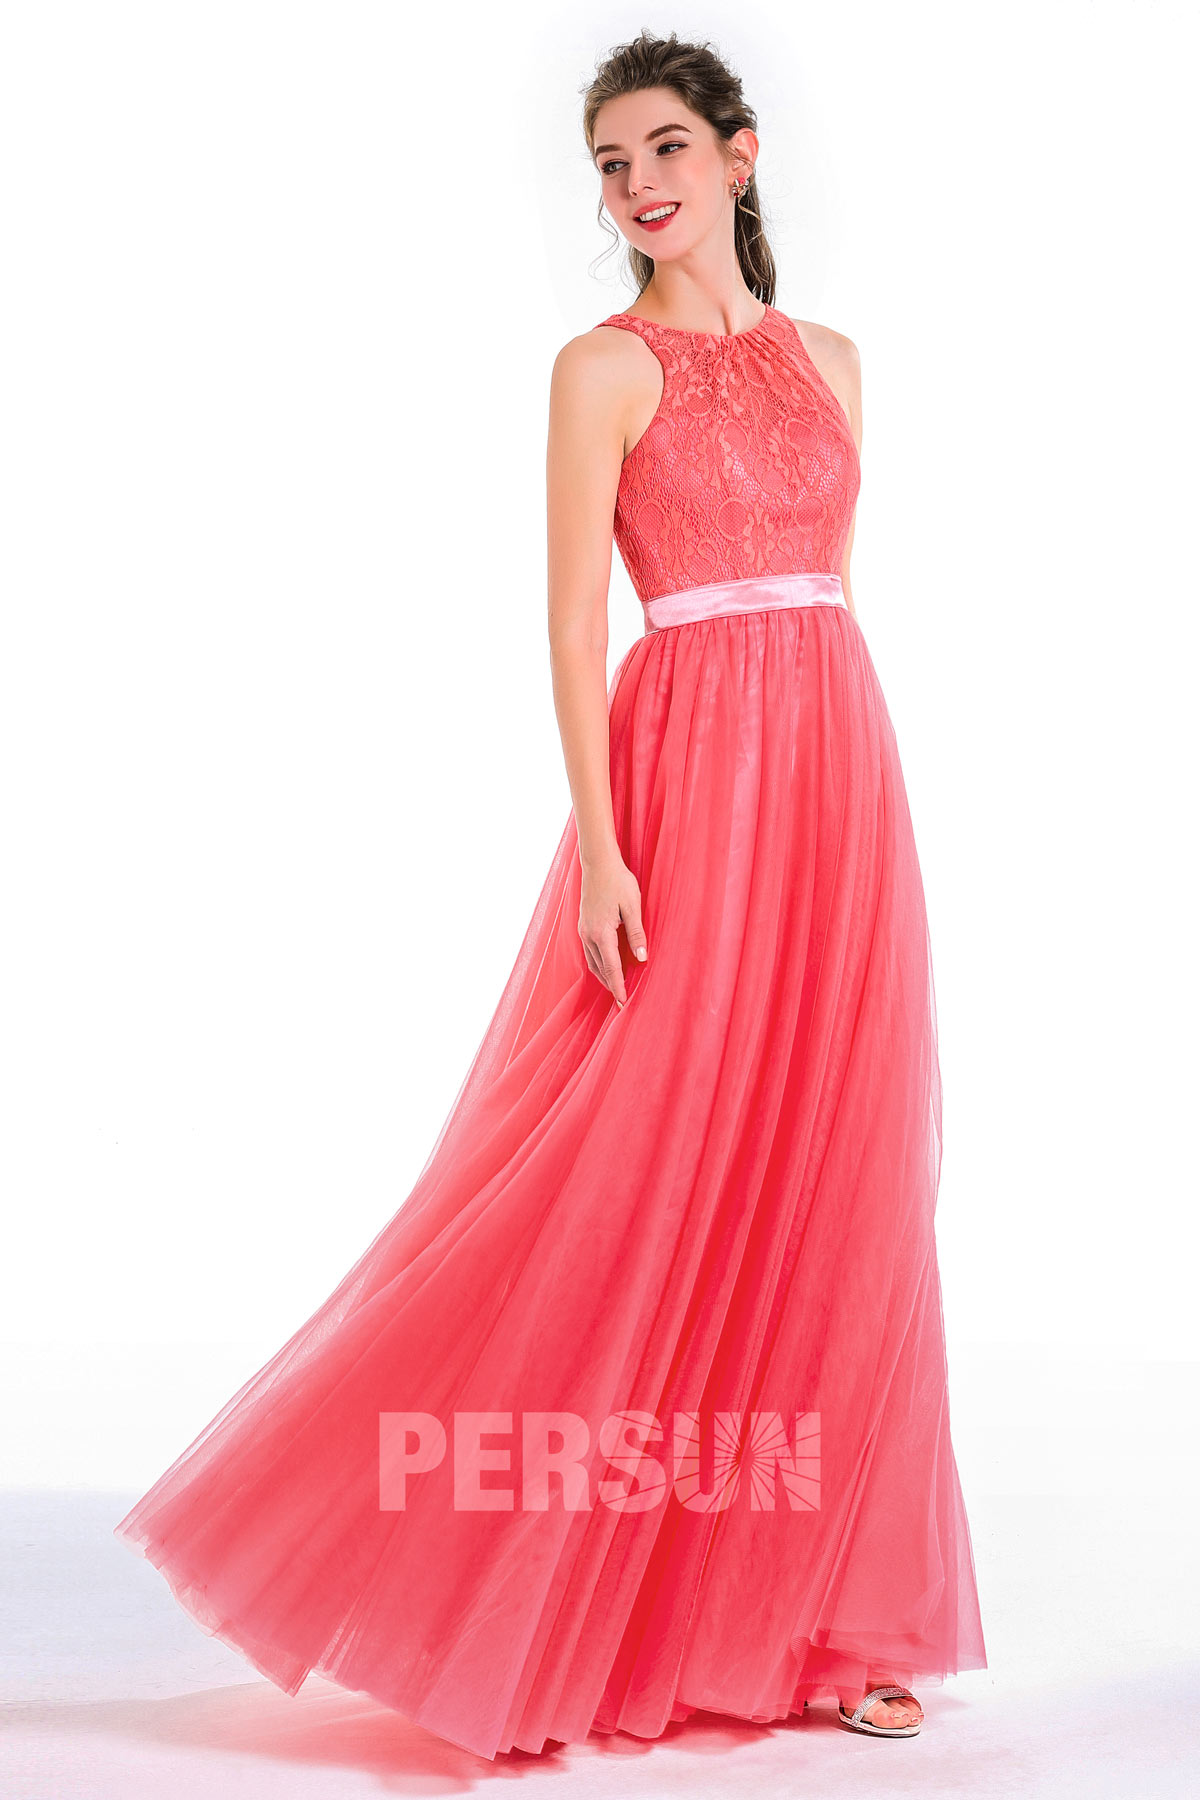 Princess-Stil Rund-Ausschnitt gefalten rosa Ballkleid lang band falten